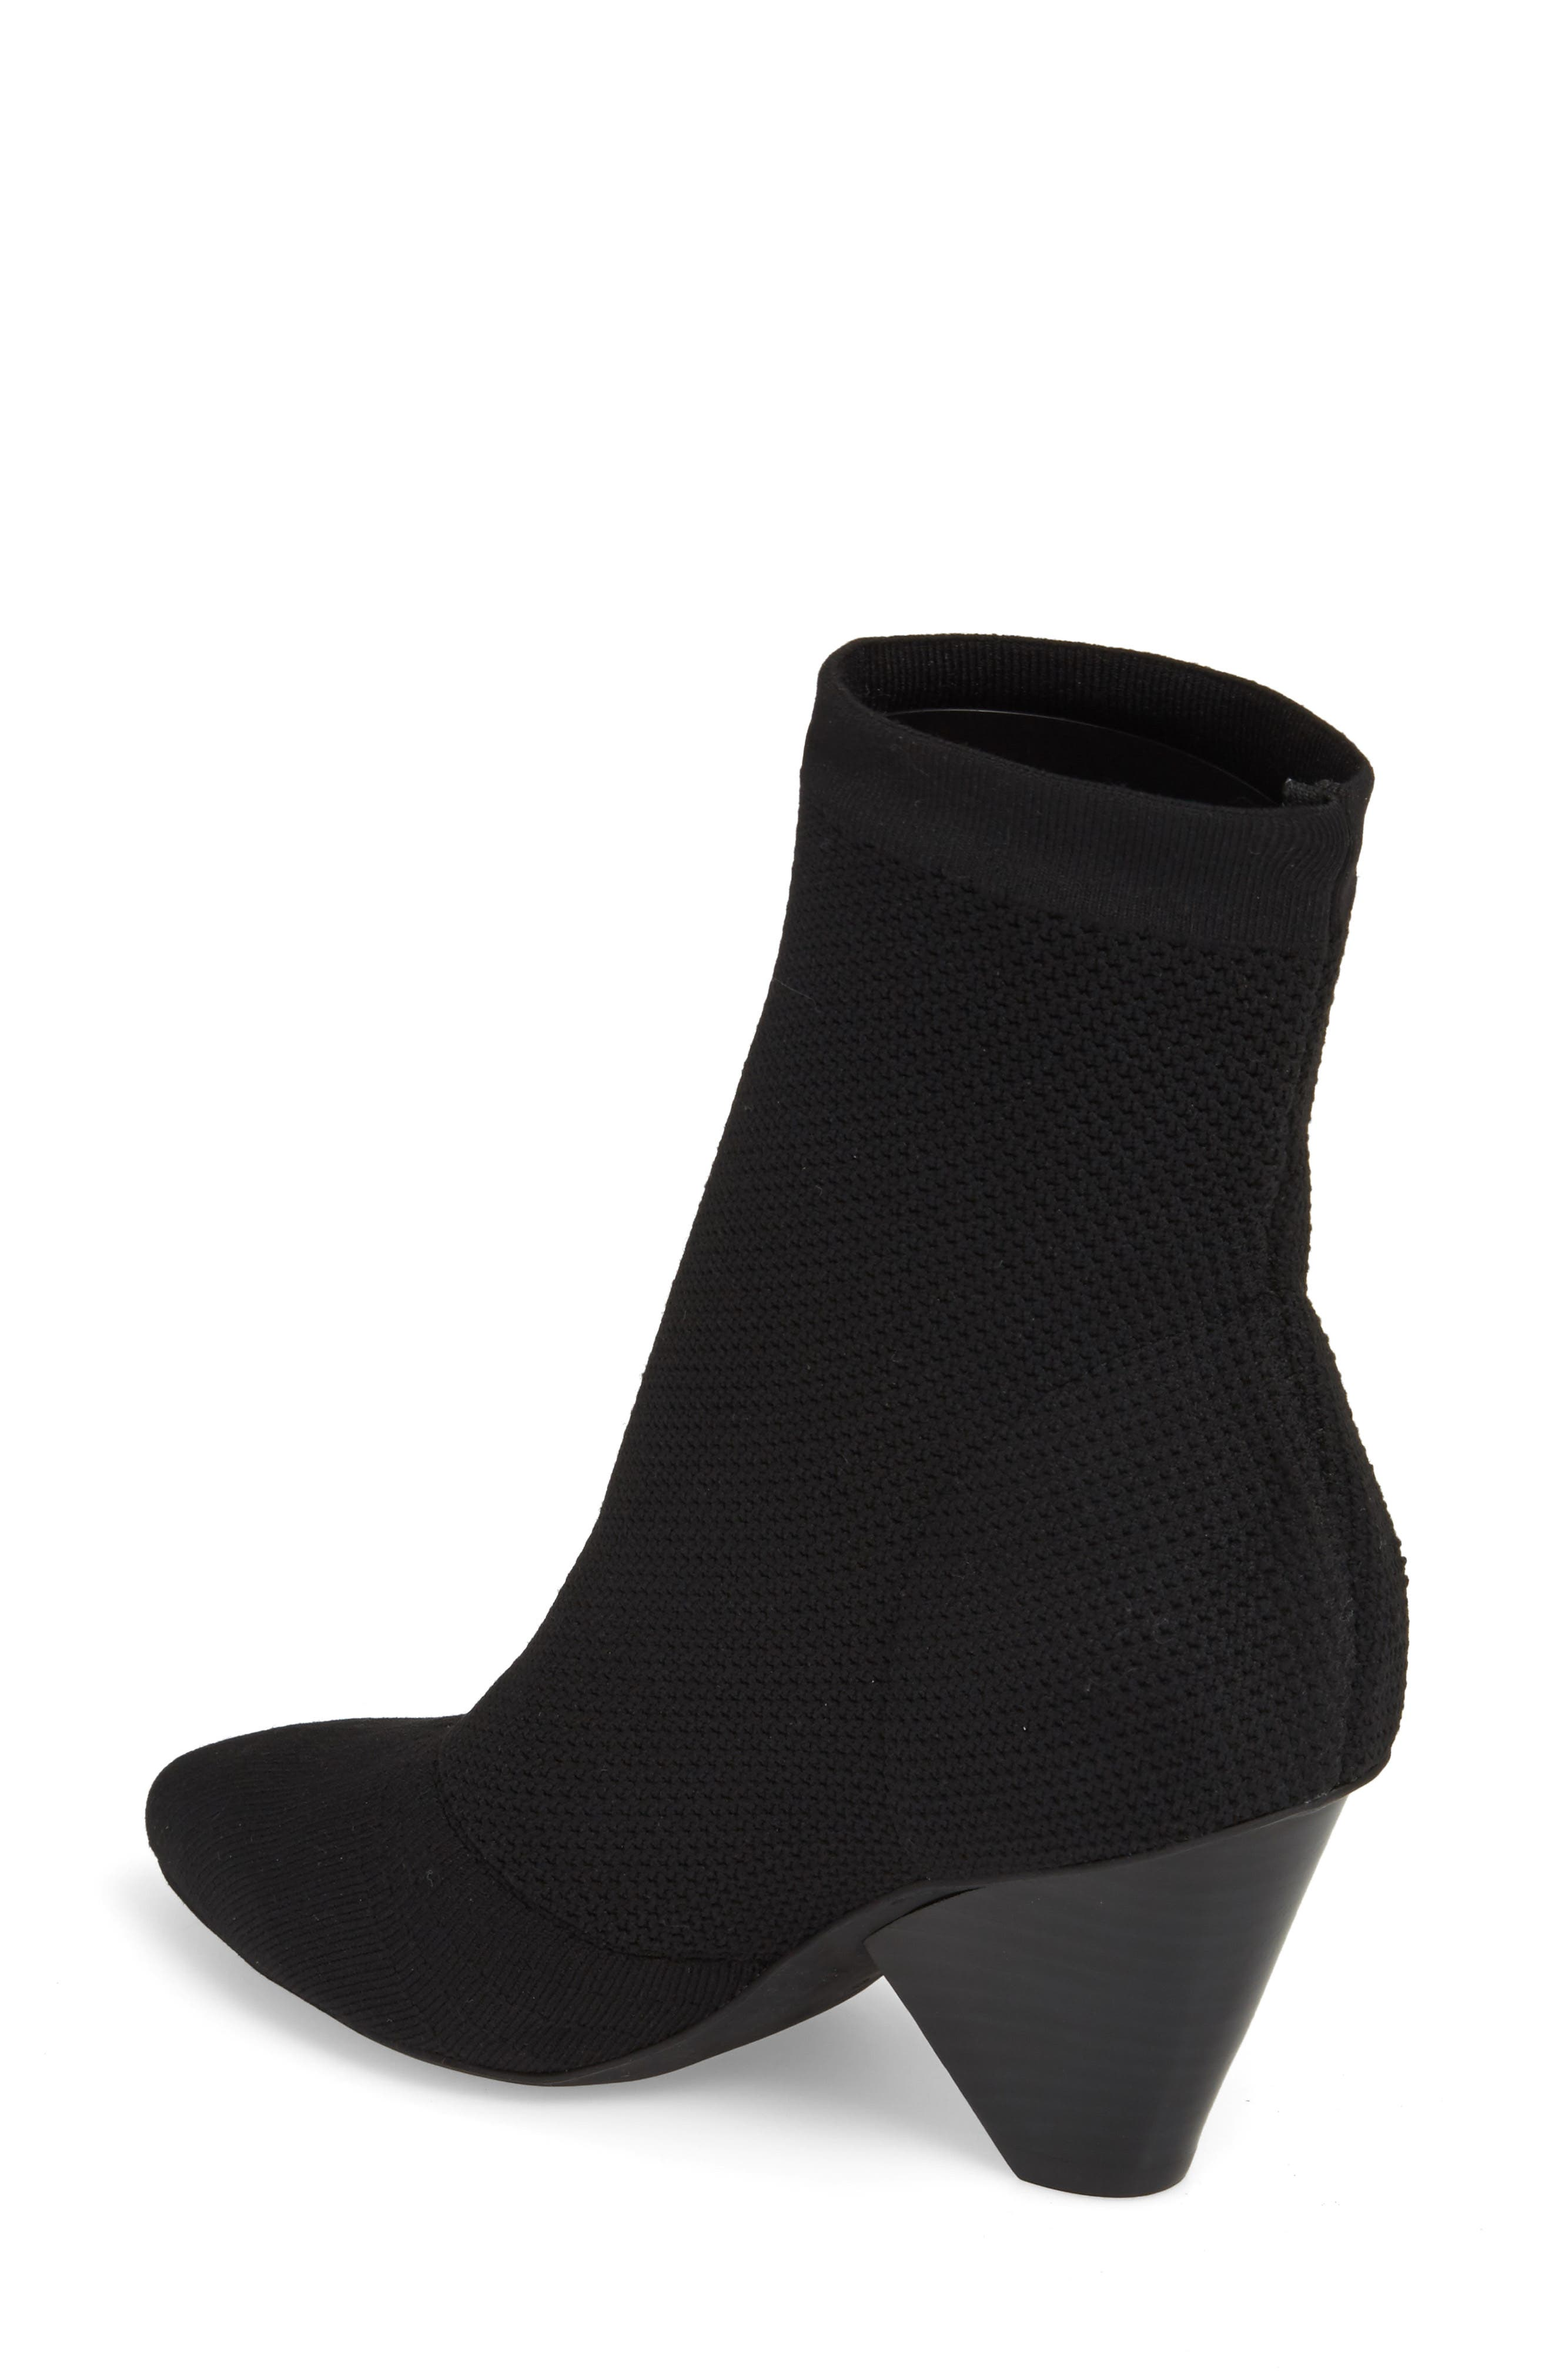 Acadia 2 Sock Bootie,                             Alternate thumbnail 2, color,                             BLACK WOVEN